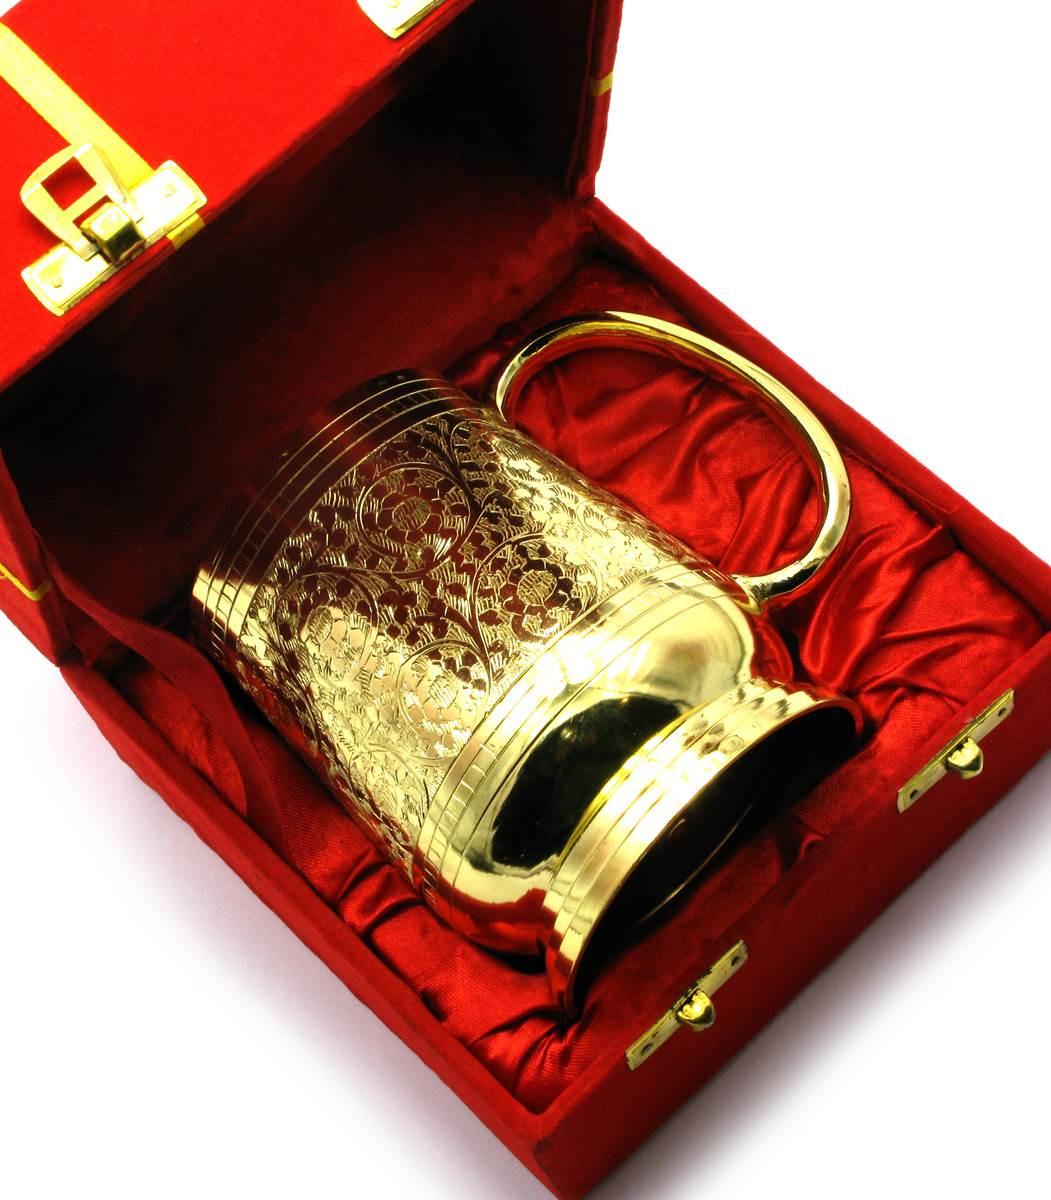 "КРУЖКА БРОНЗОВАЯ ПОЗОЛОЧЕНАЯ (15Х14,5Х10 СМ)(VELVET BOX BEER MUG SMALL GOLD) - Магазин  ""Дариленд""  в Харькове"